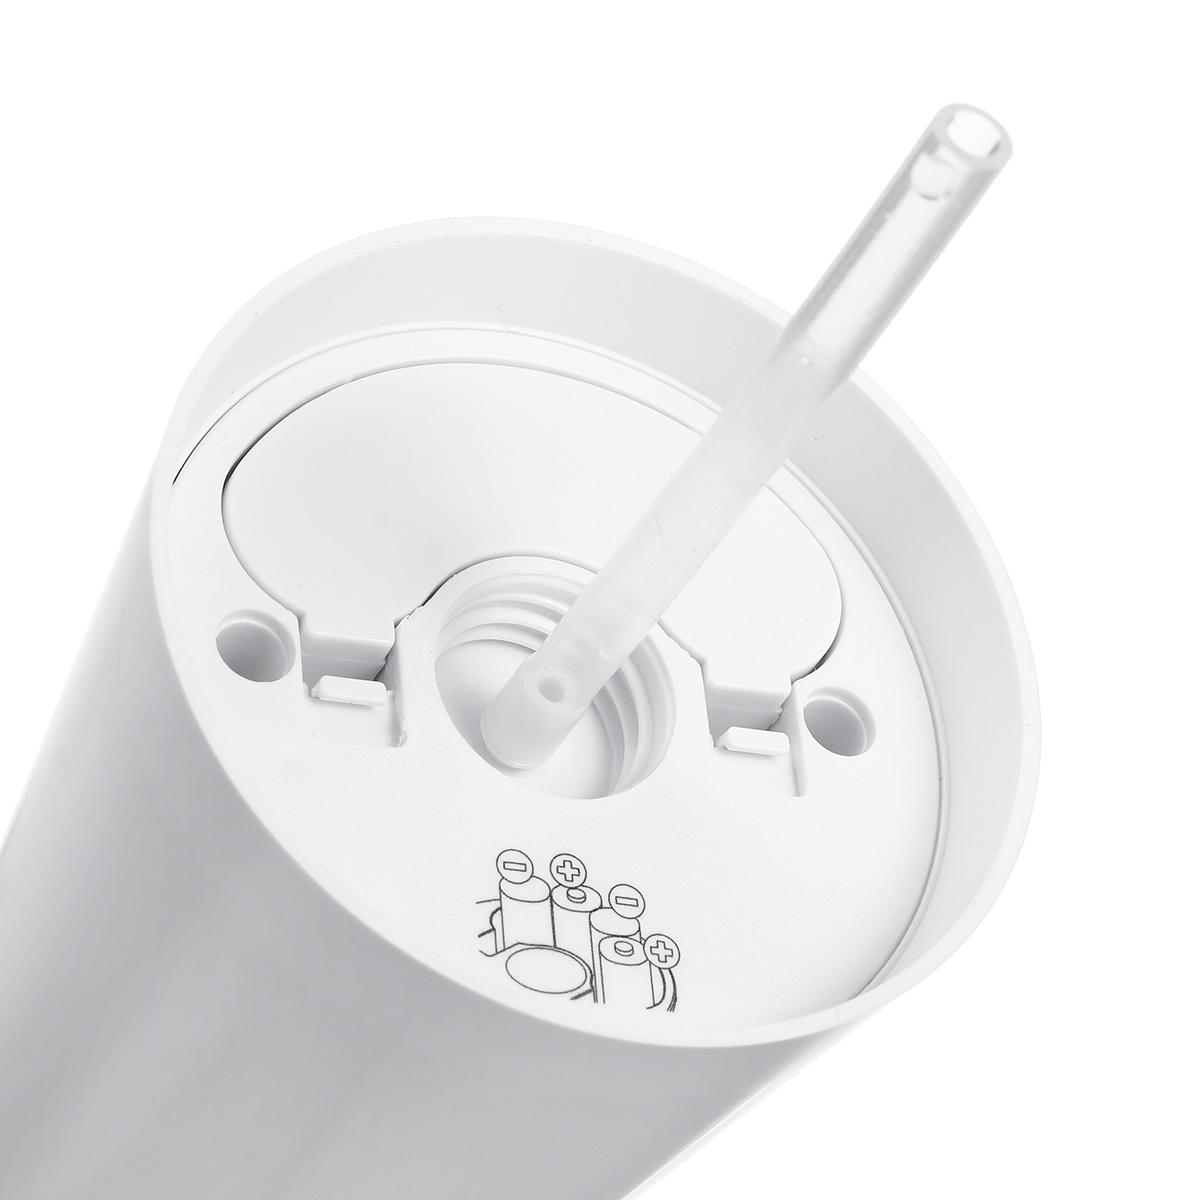 250ml Smart Liquid Soap Dispenser 3 Speeds Automatic Induction Foam Hand Sanitizer Washing Machine